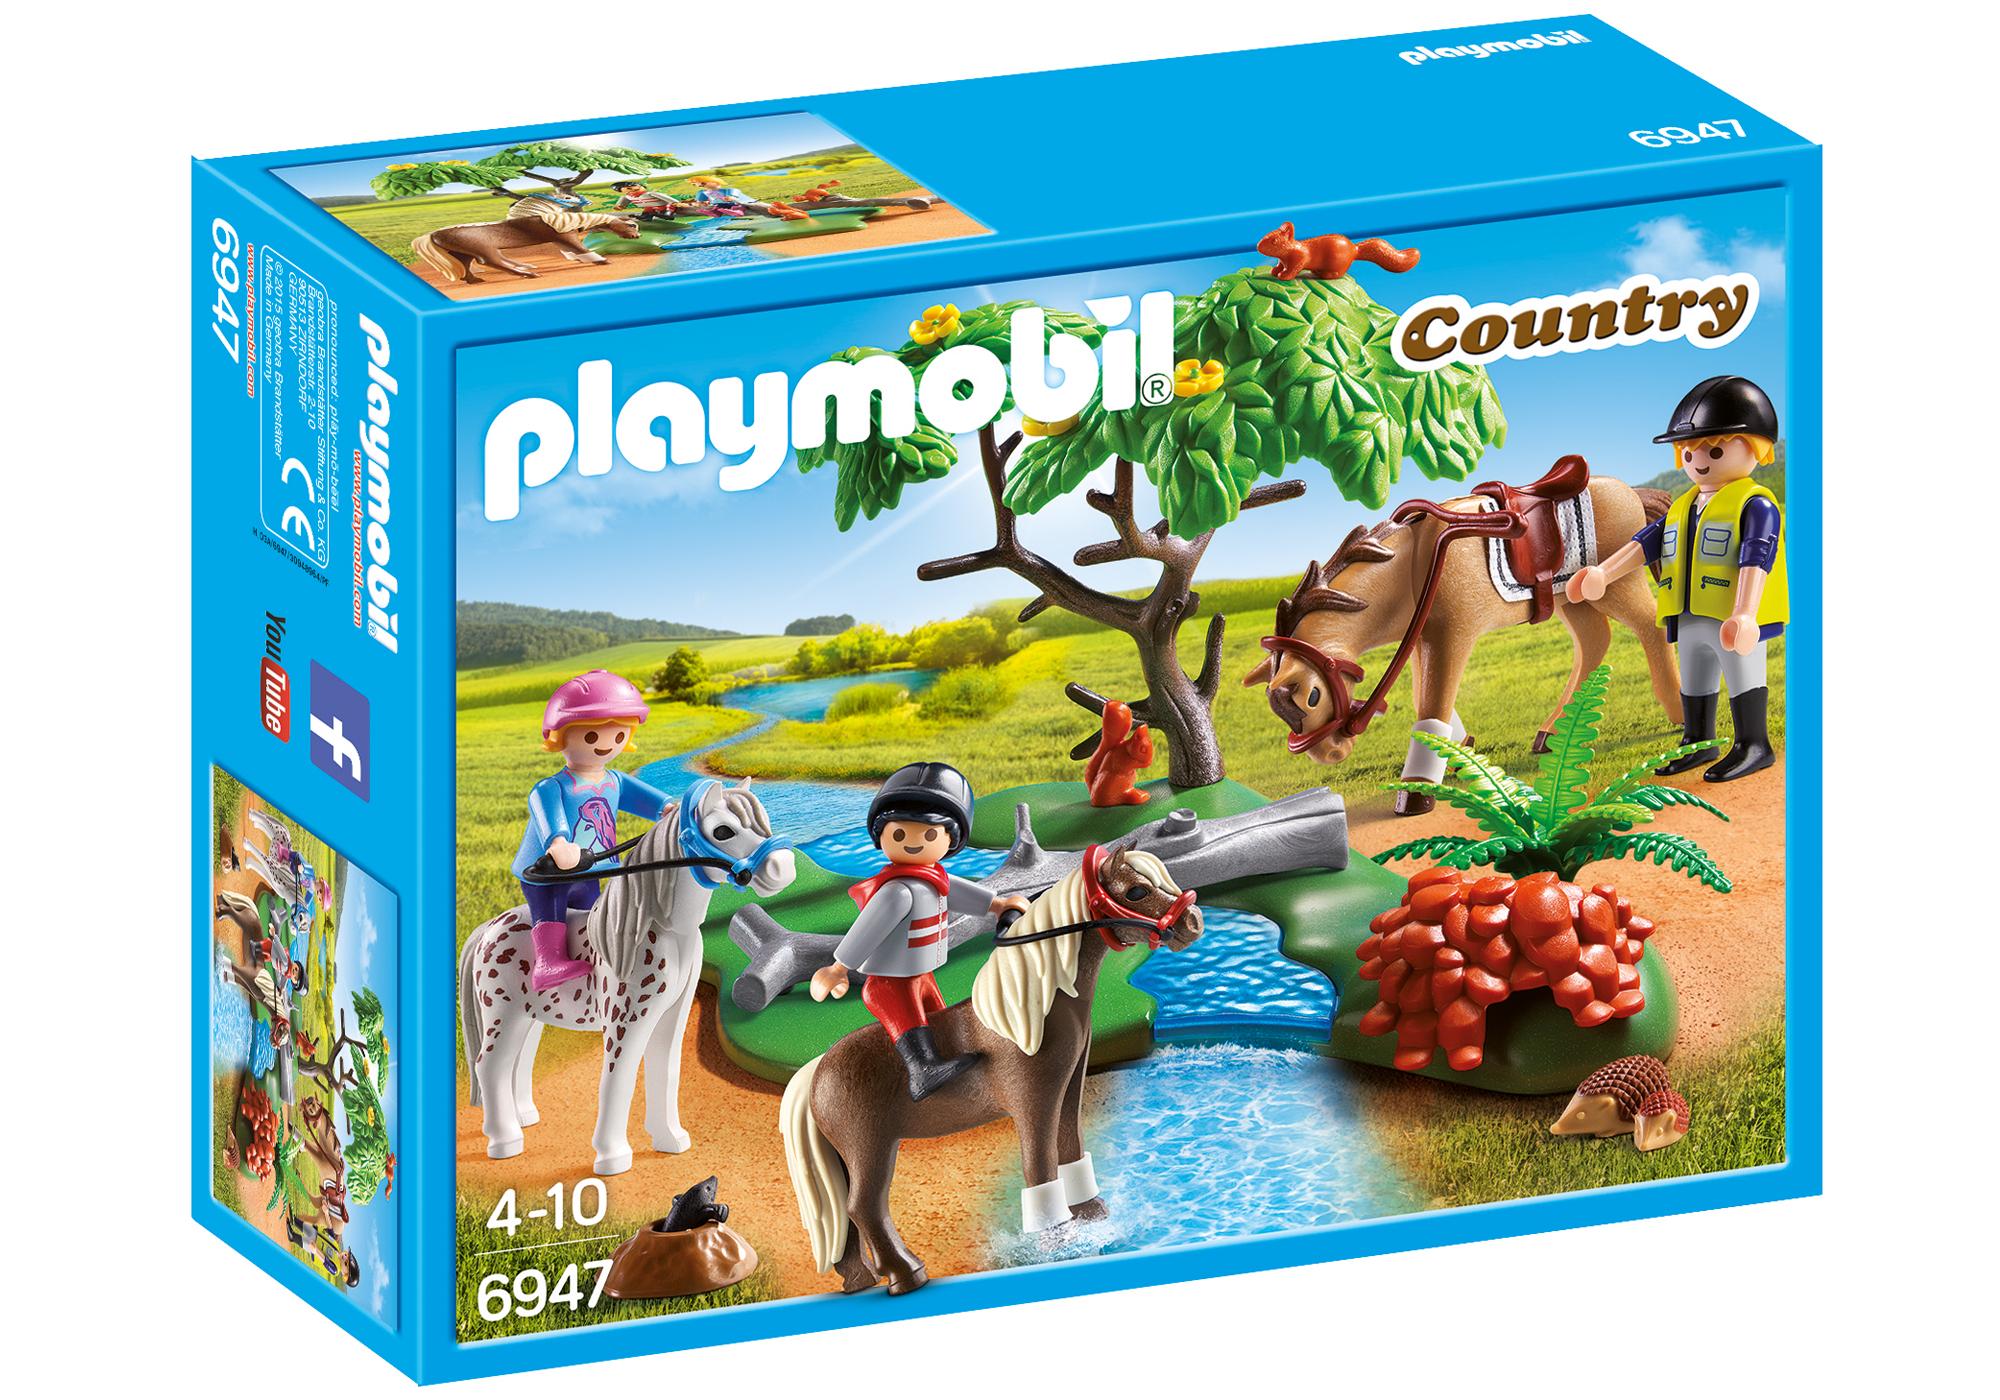 http://media.playmobil.com/i/playmobil/6947_product_box_front/Country Horseback Ride